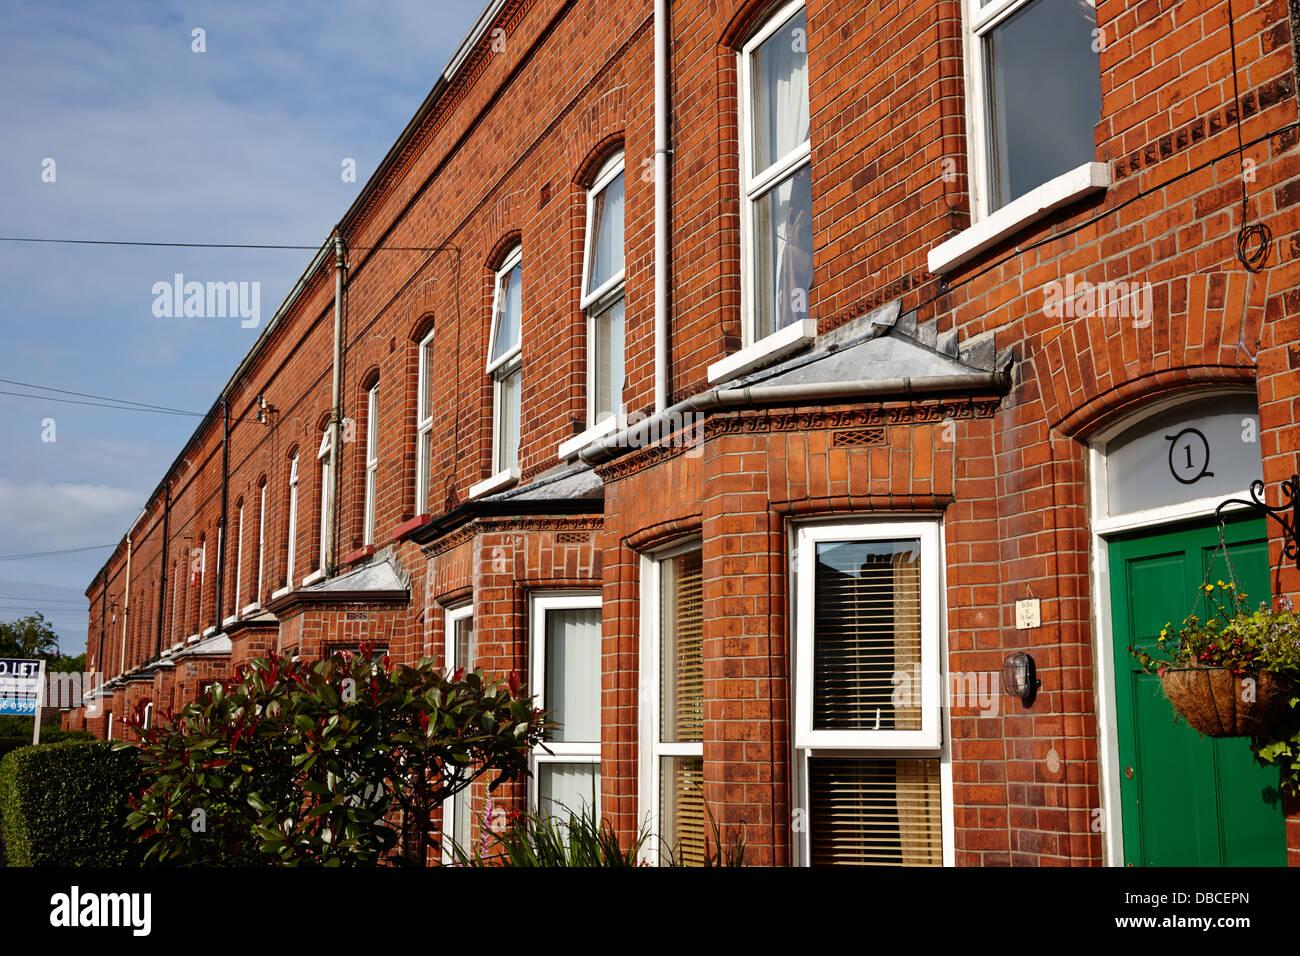 Victorian Red Brick Terraced Homes In Belfast Northern Ireland Uk   Stock  Image